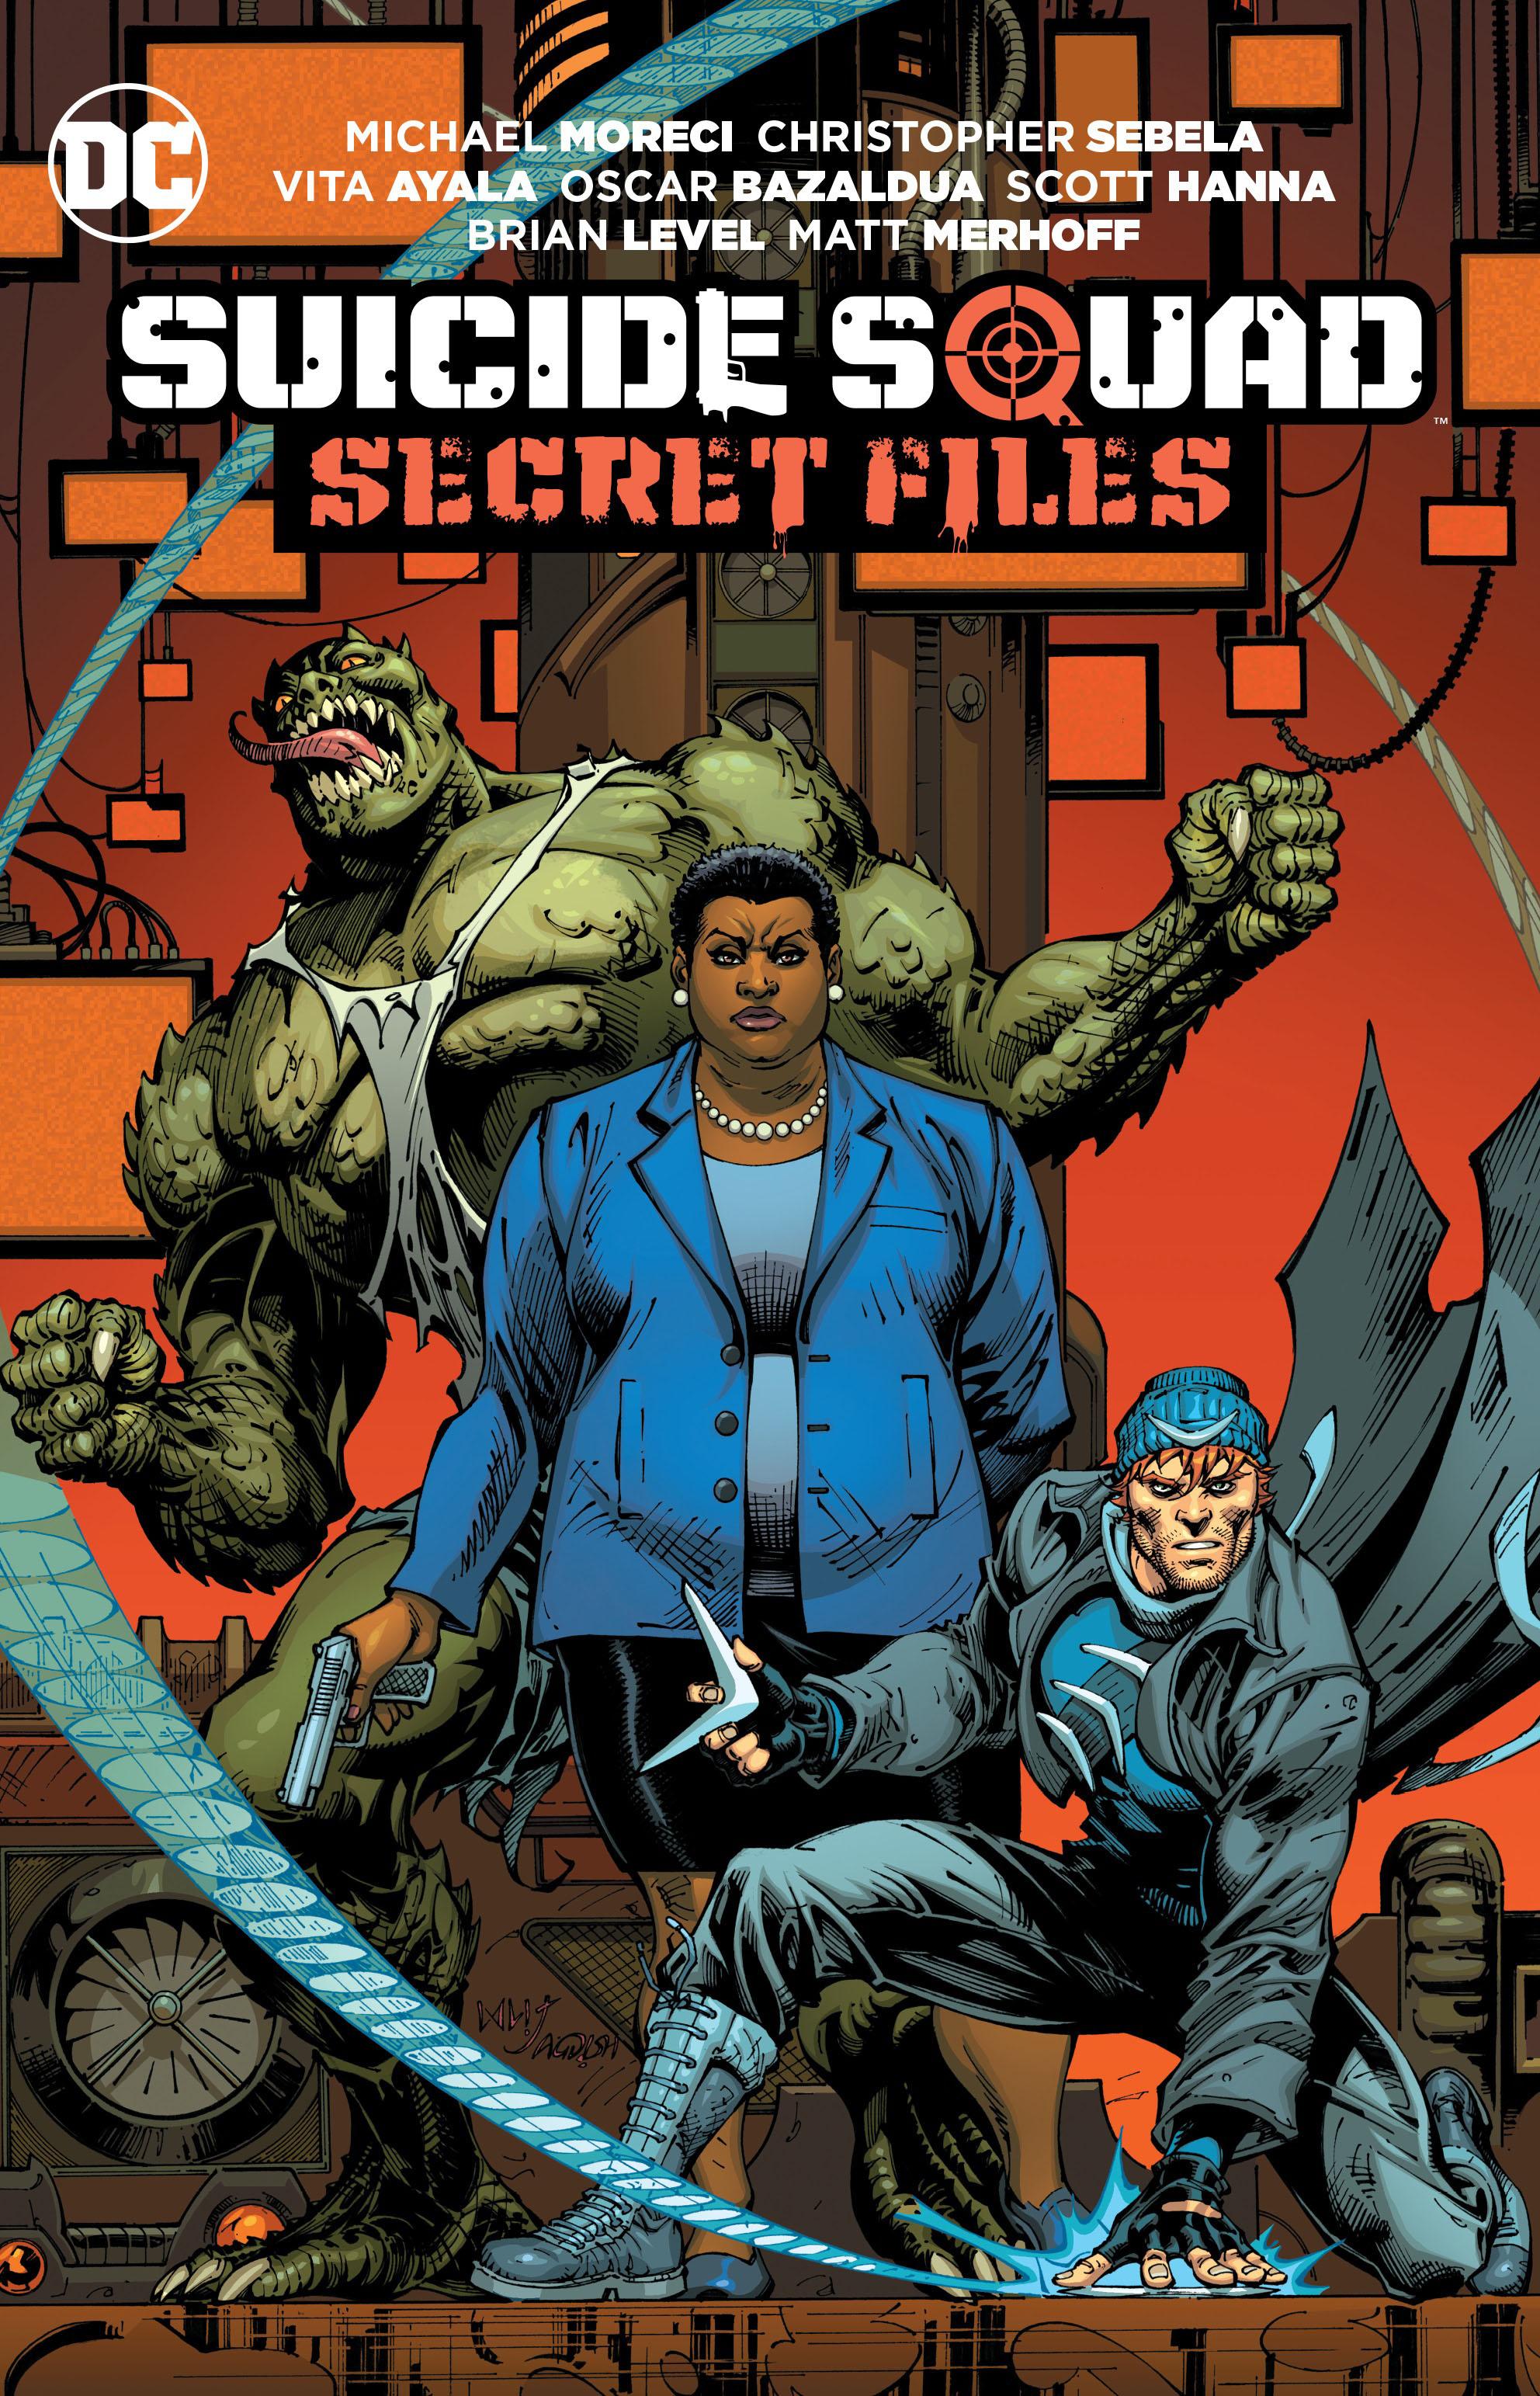 Suicide Squad: Secret Files slime squad vs the toxic teeth